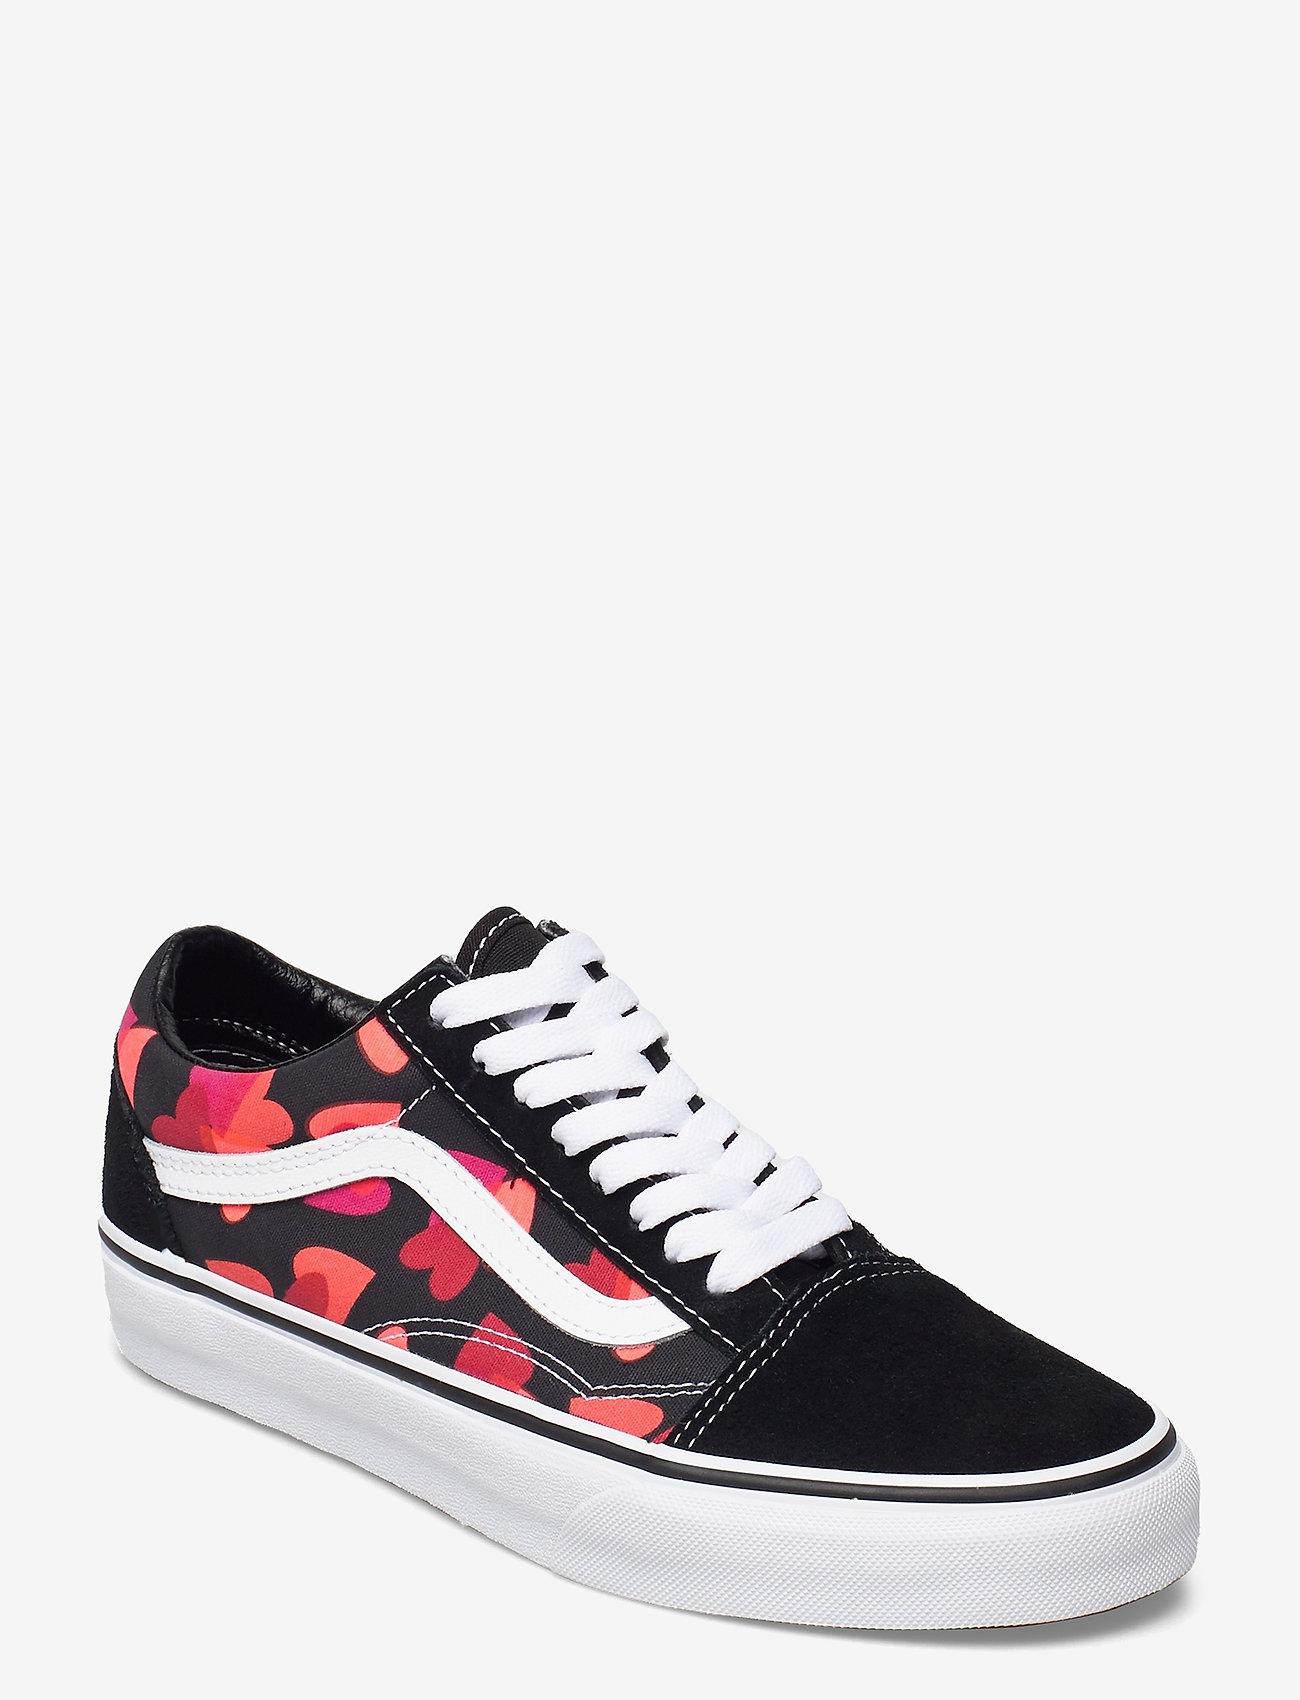 VANS - UA Old Skool - lave sneakers - (valentneshrts)blkfchsprp - 0